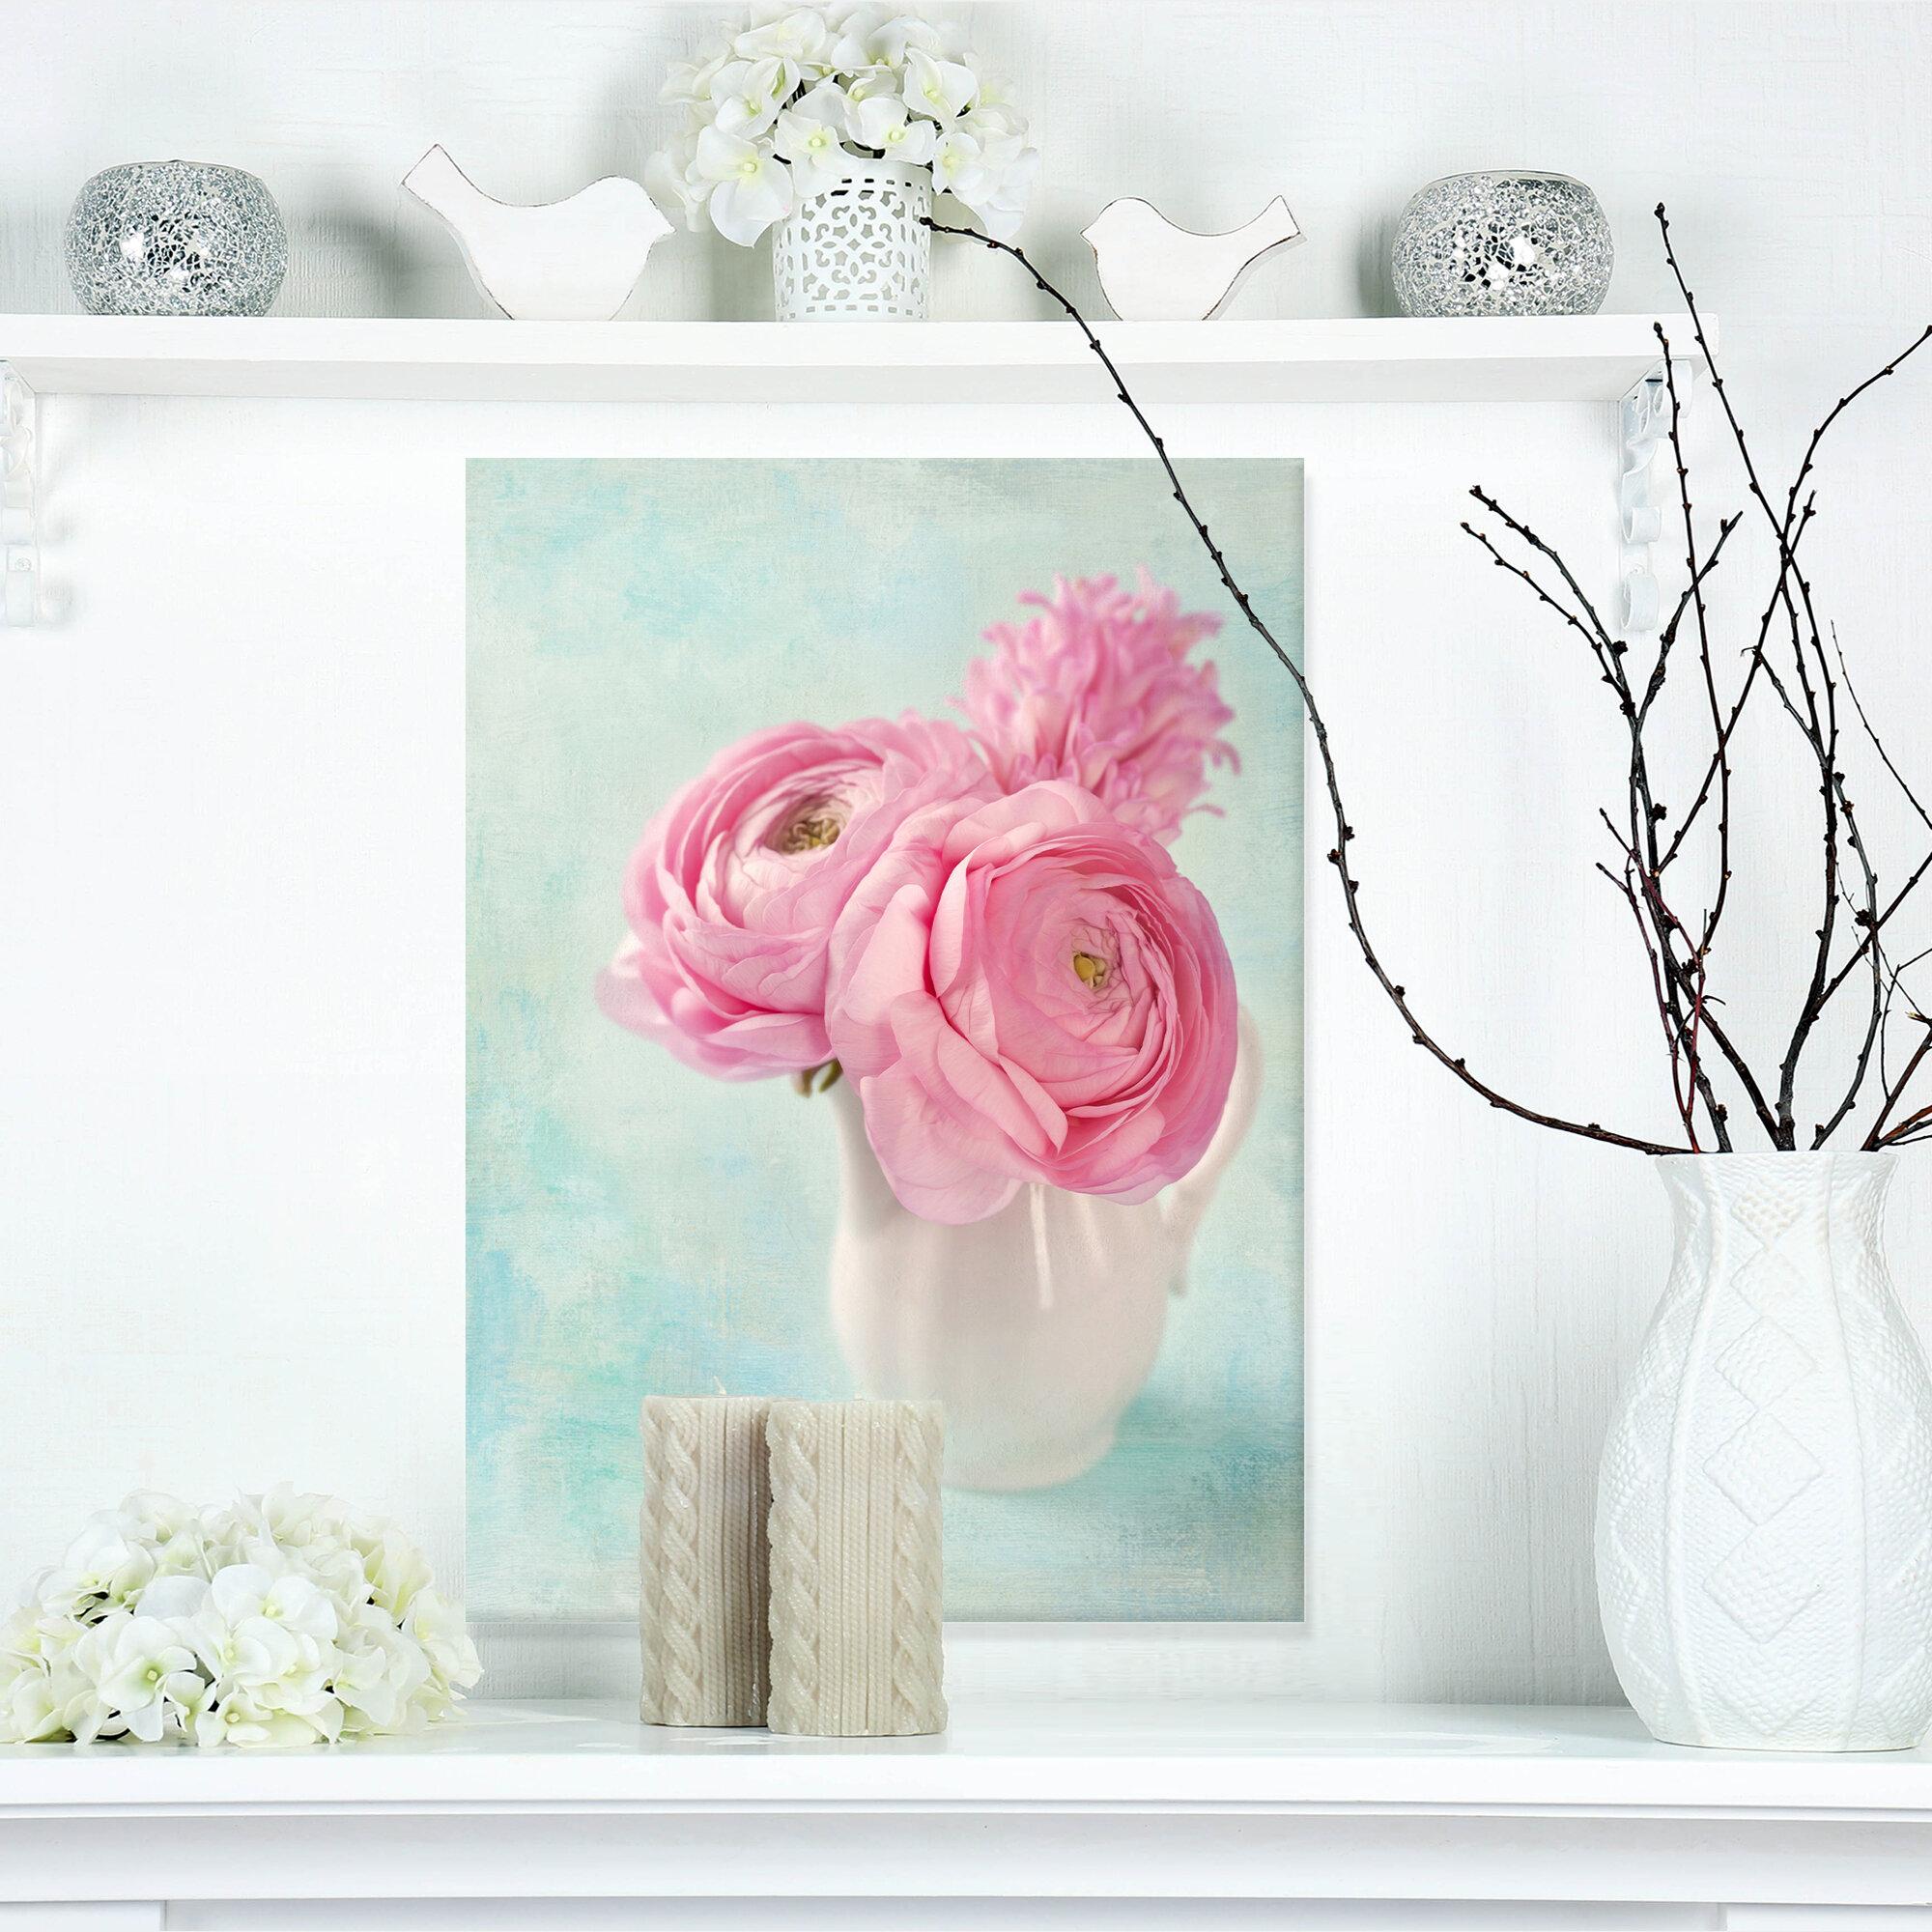 Designart Pink Ranunculus Flowers In Vase Painting Print On Wrapped Canvas Wayfair